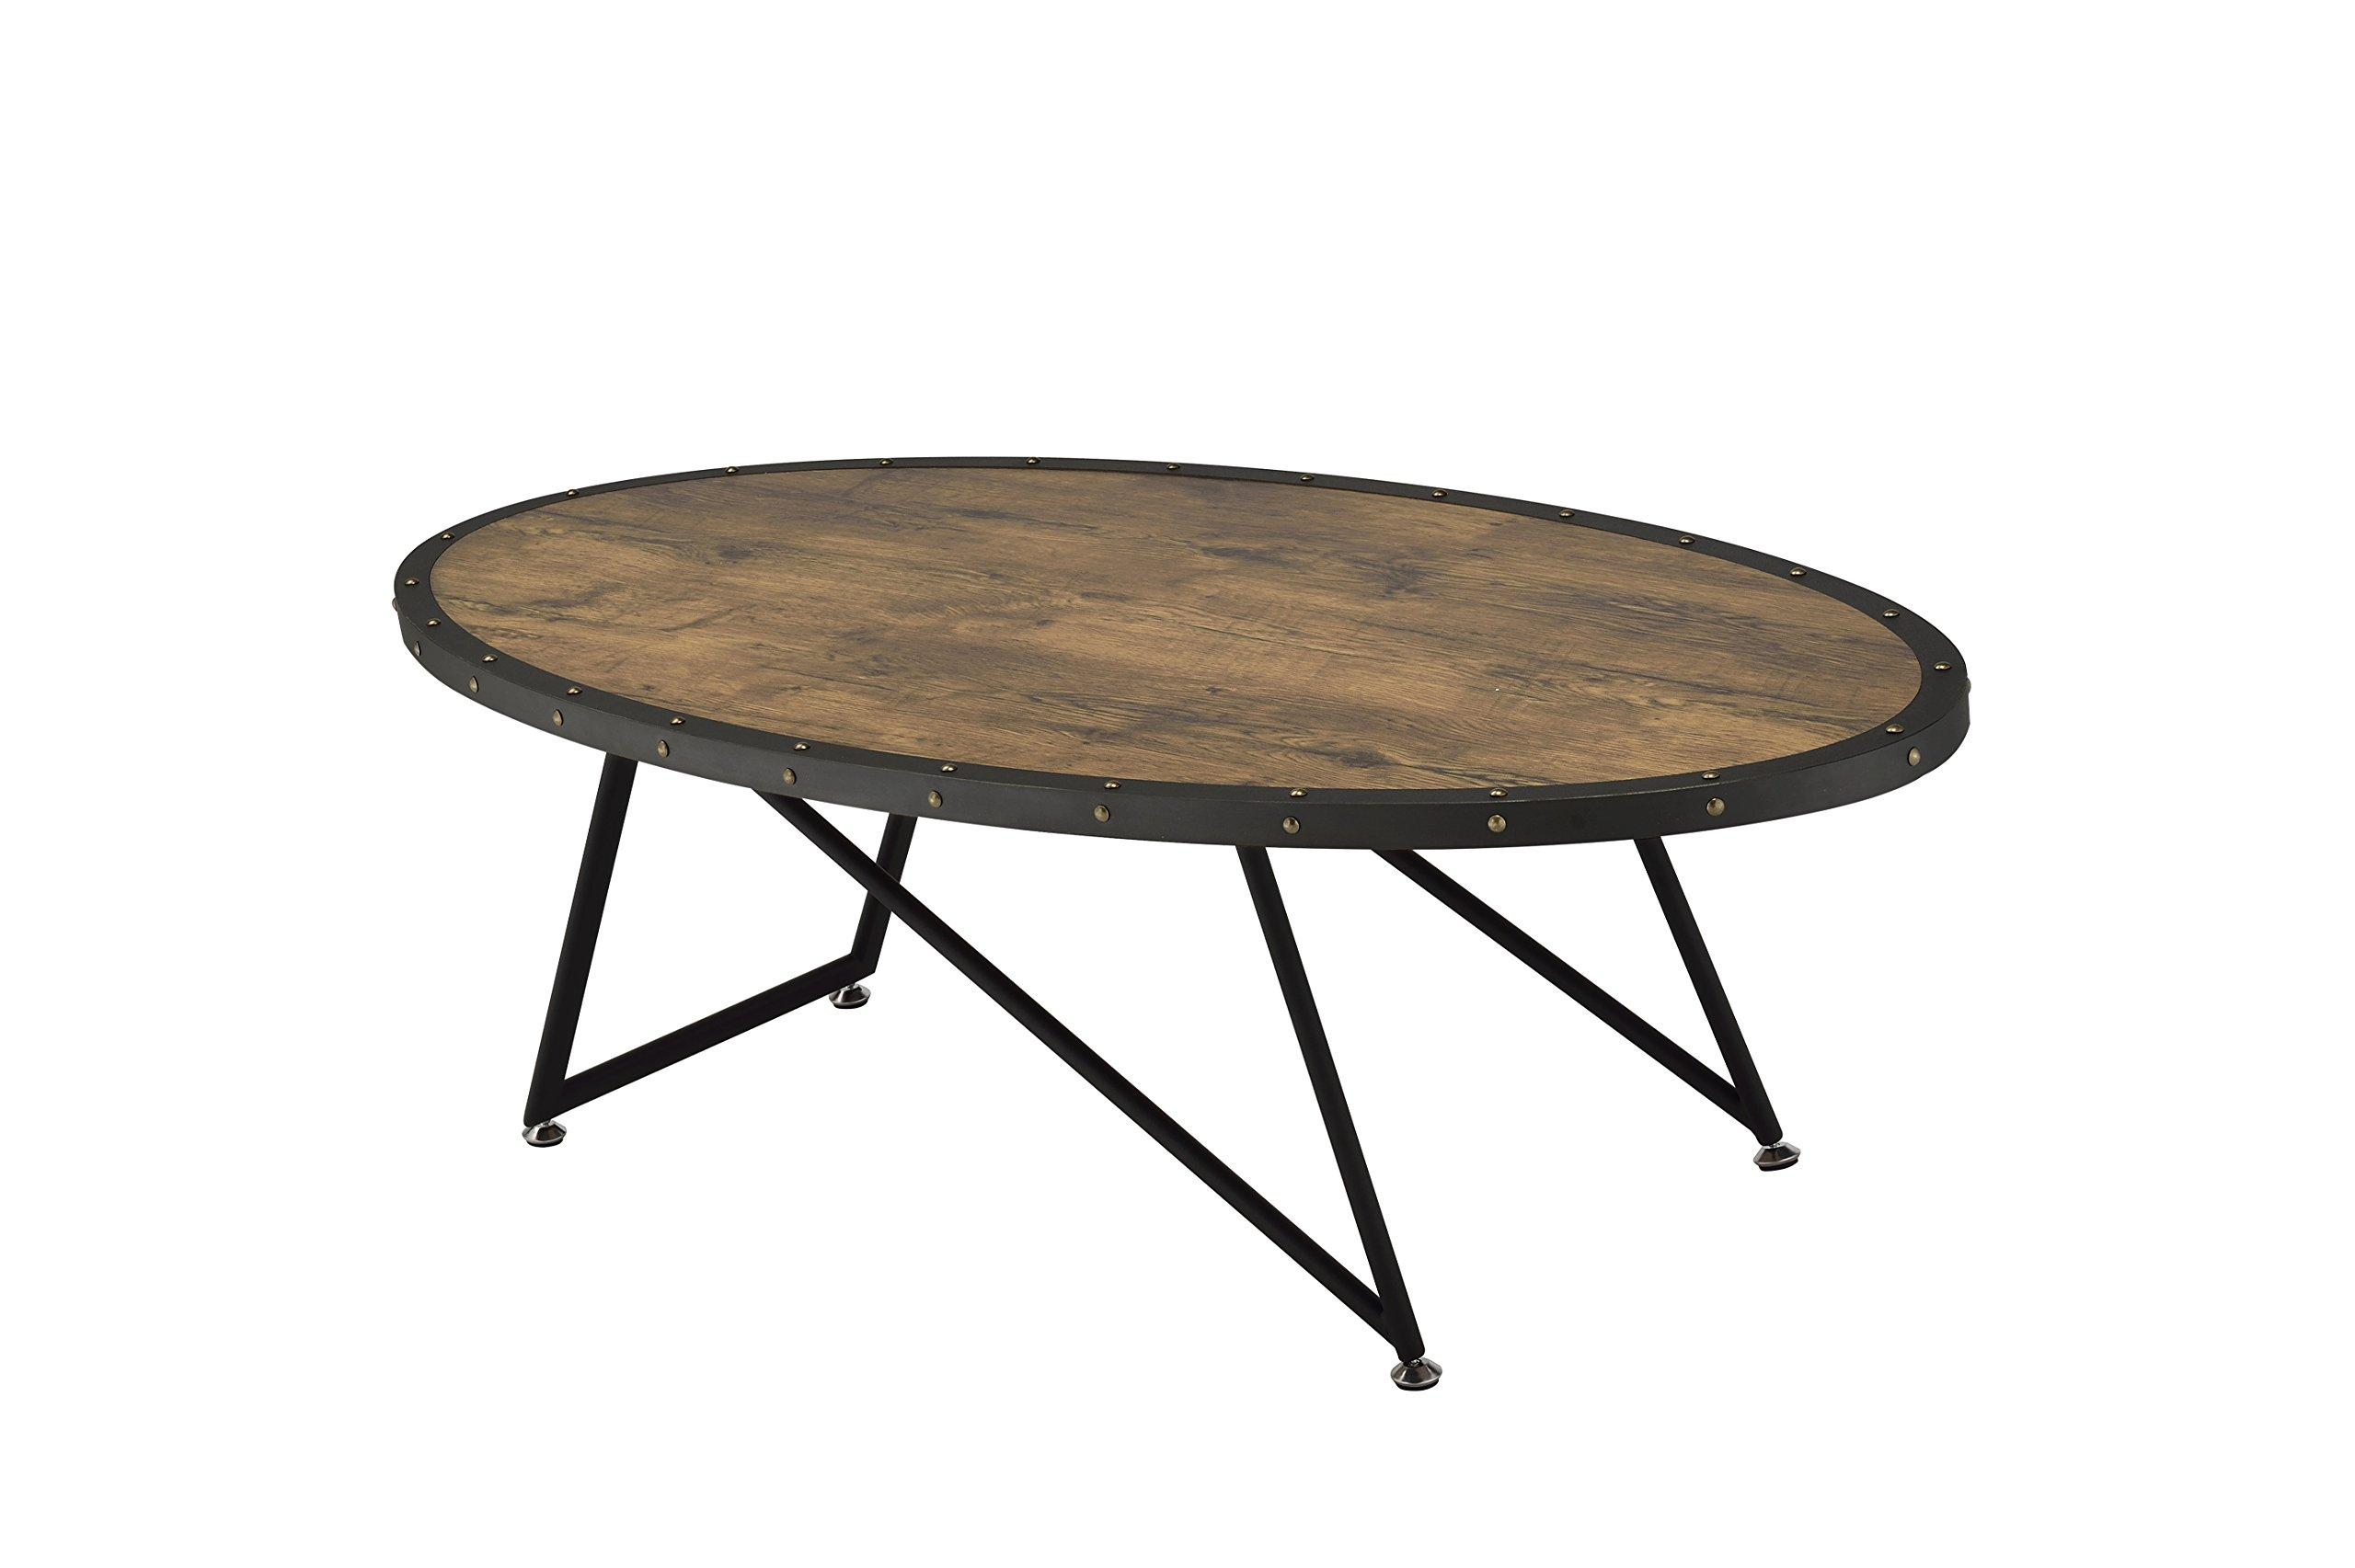 ACME Furniture Acme 81725 Allis Coffee Table, Weathered Dark Oak, One Size